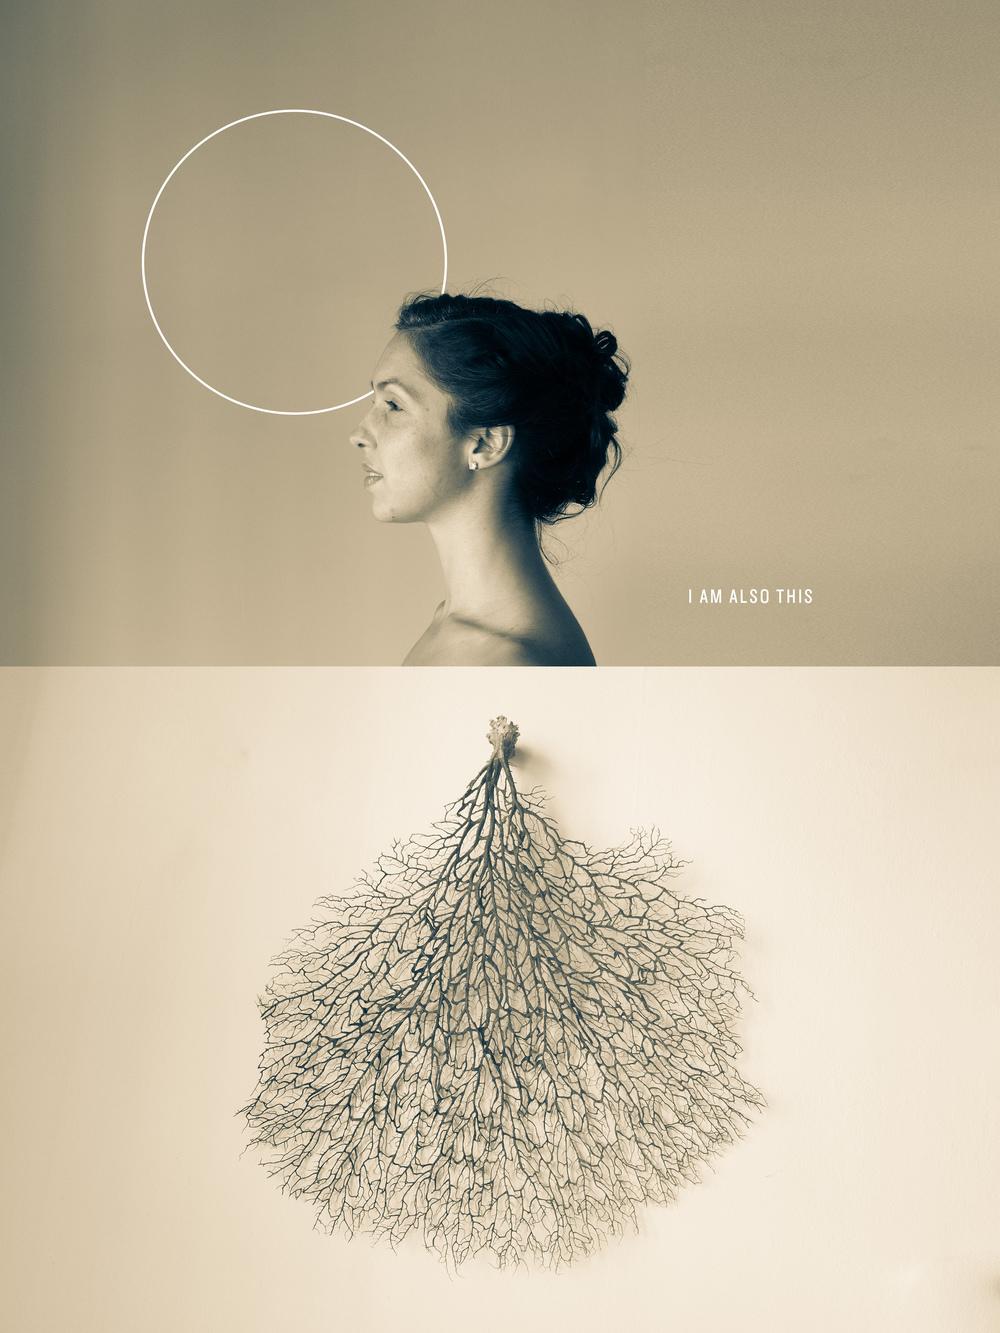 iamalsothis by Memetica